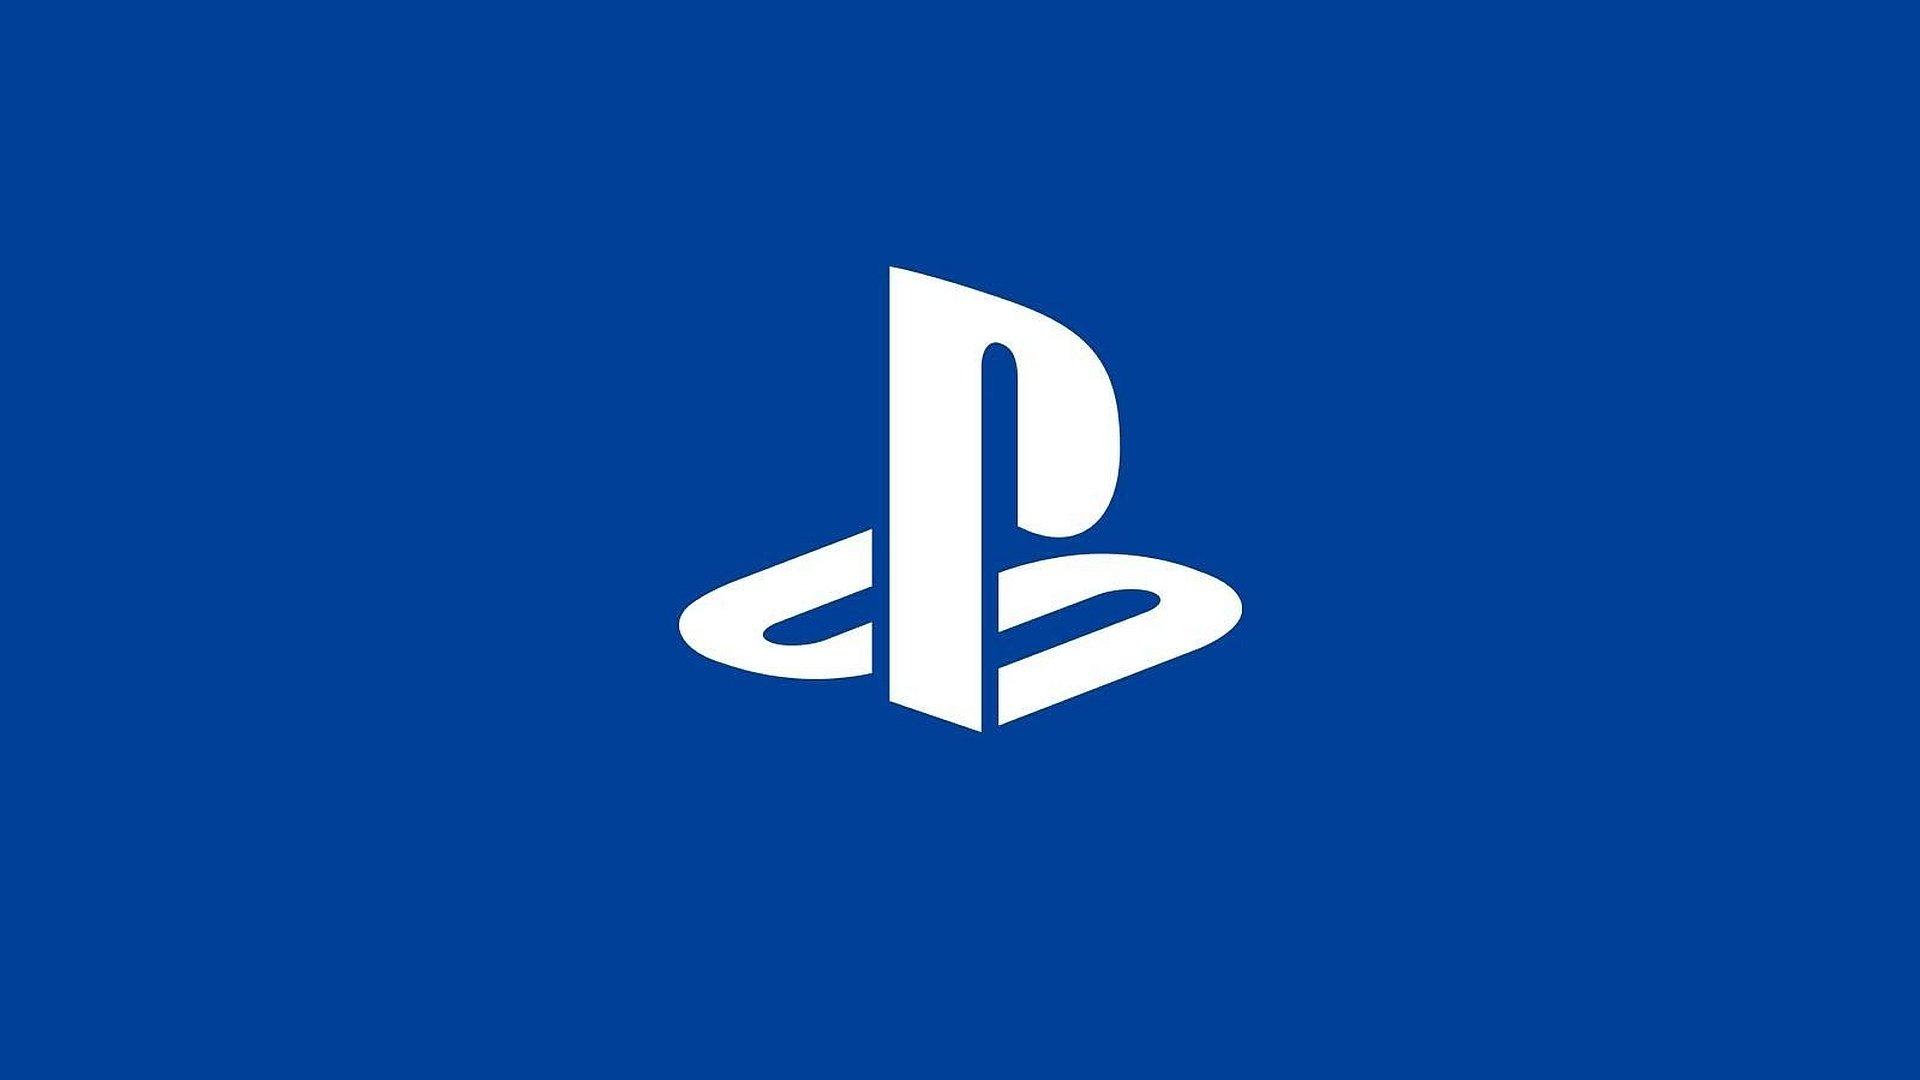 Baixa Papel De Parede Ps3: Playstation Papel De Parede HD